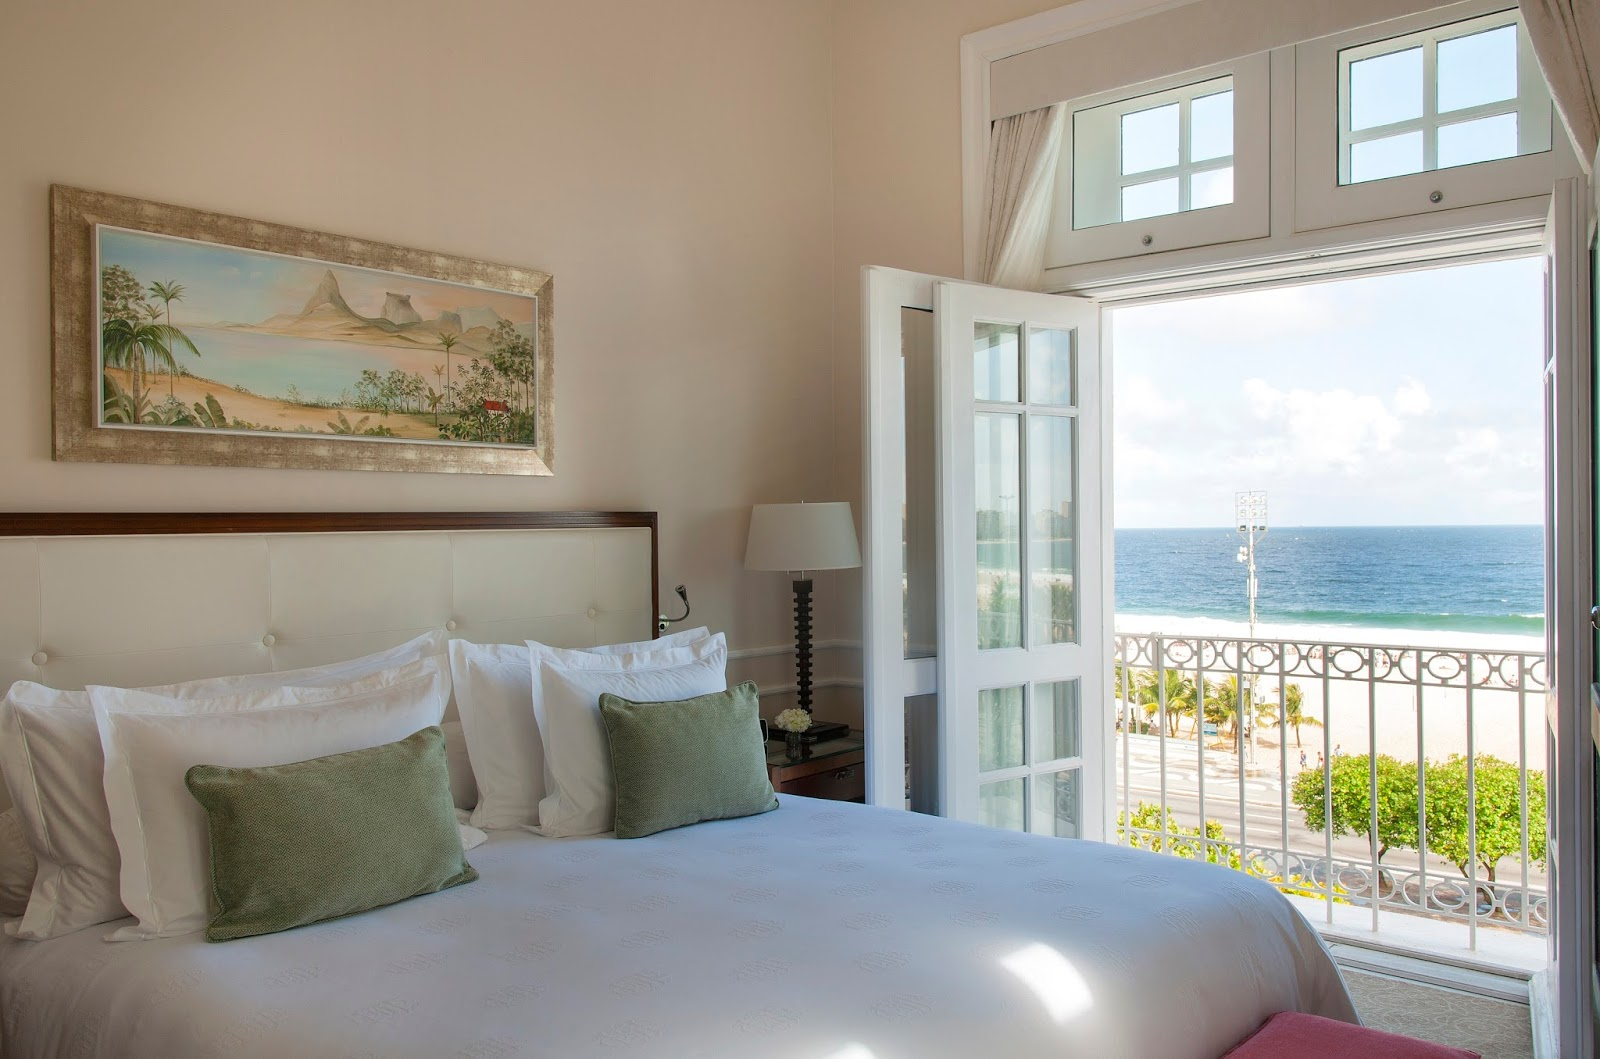 Belmond Copacabana Palace Hotel Room